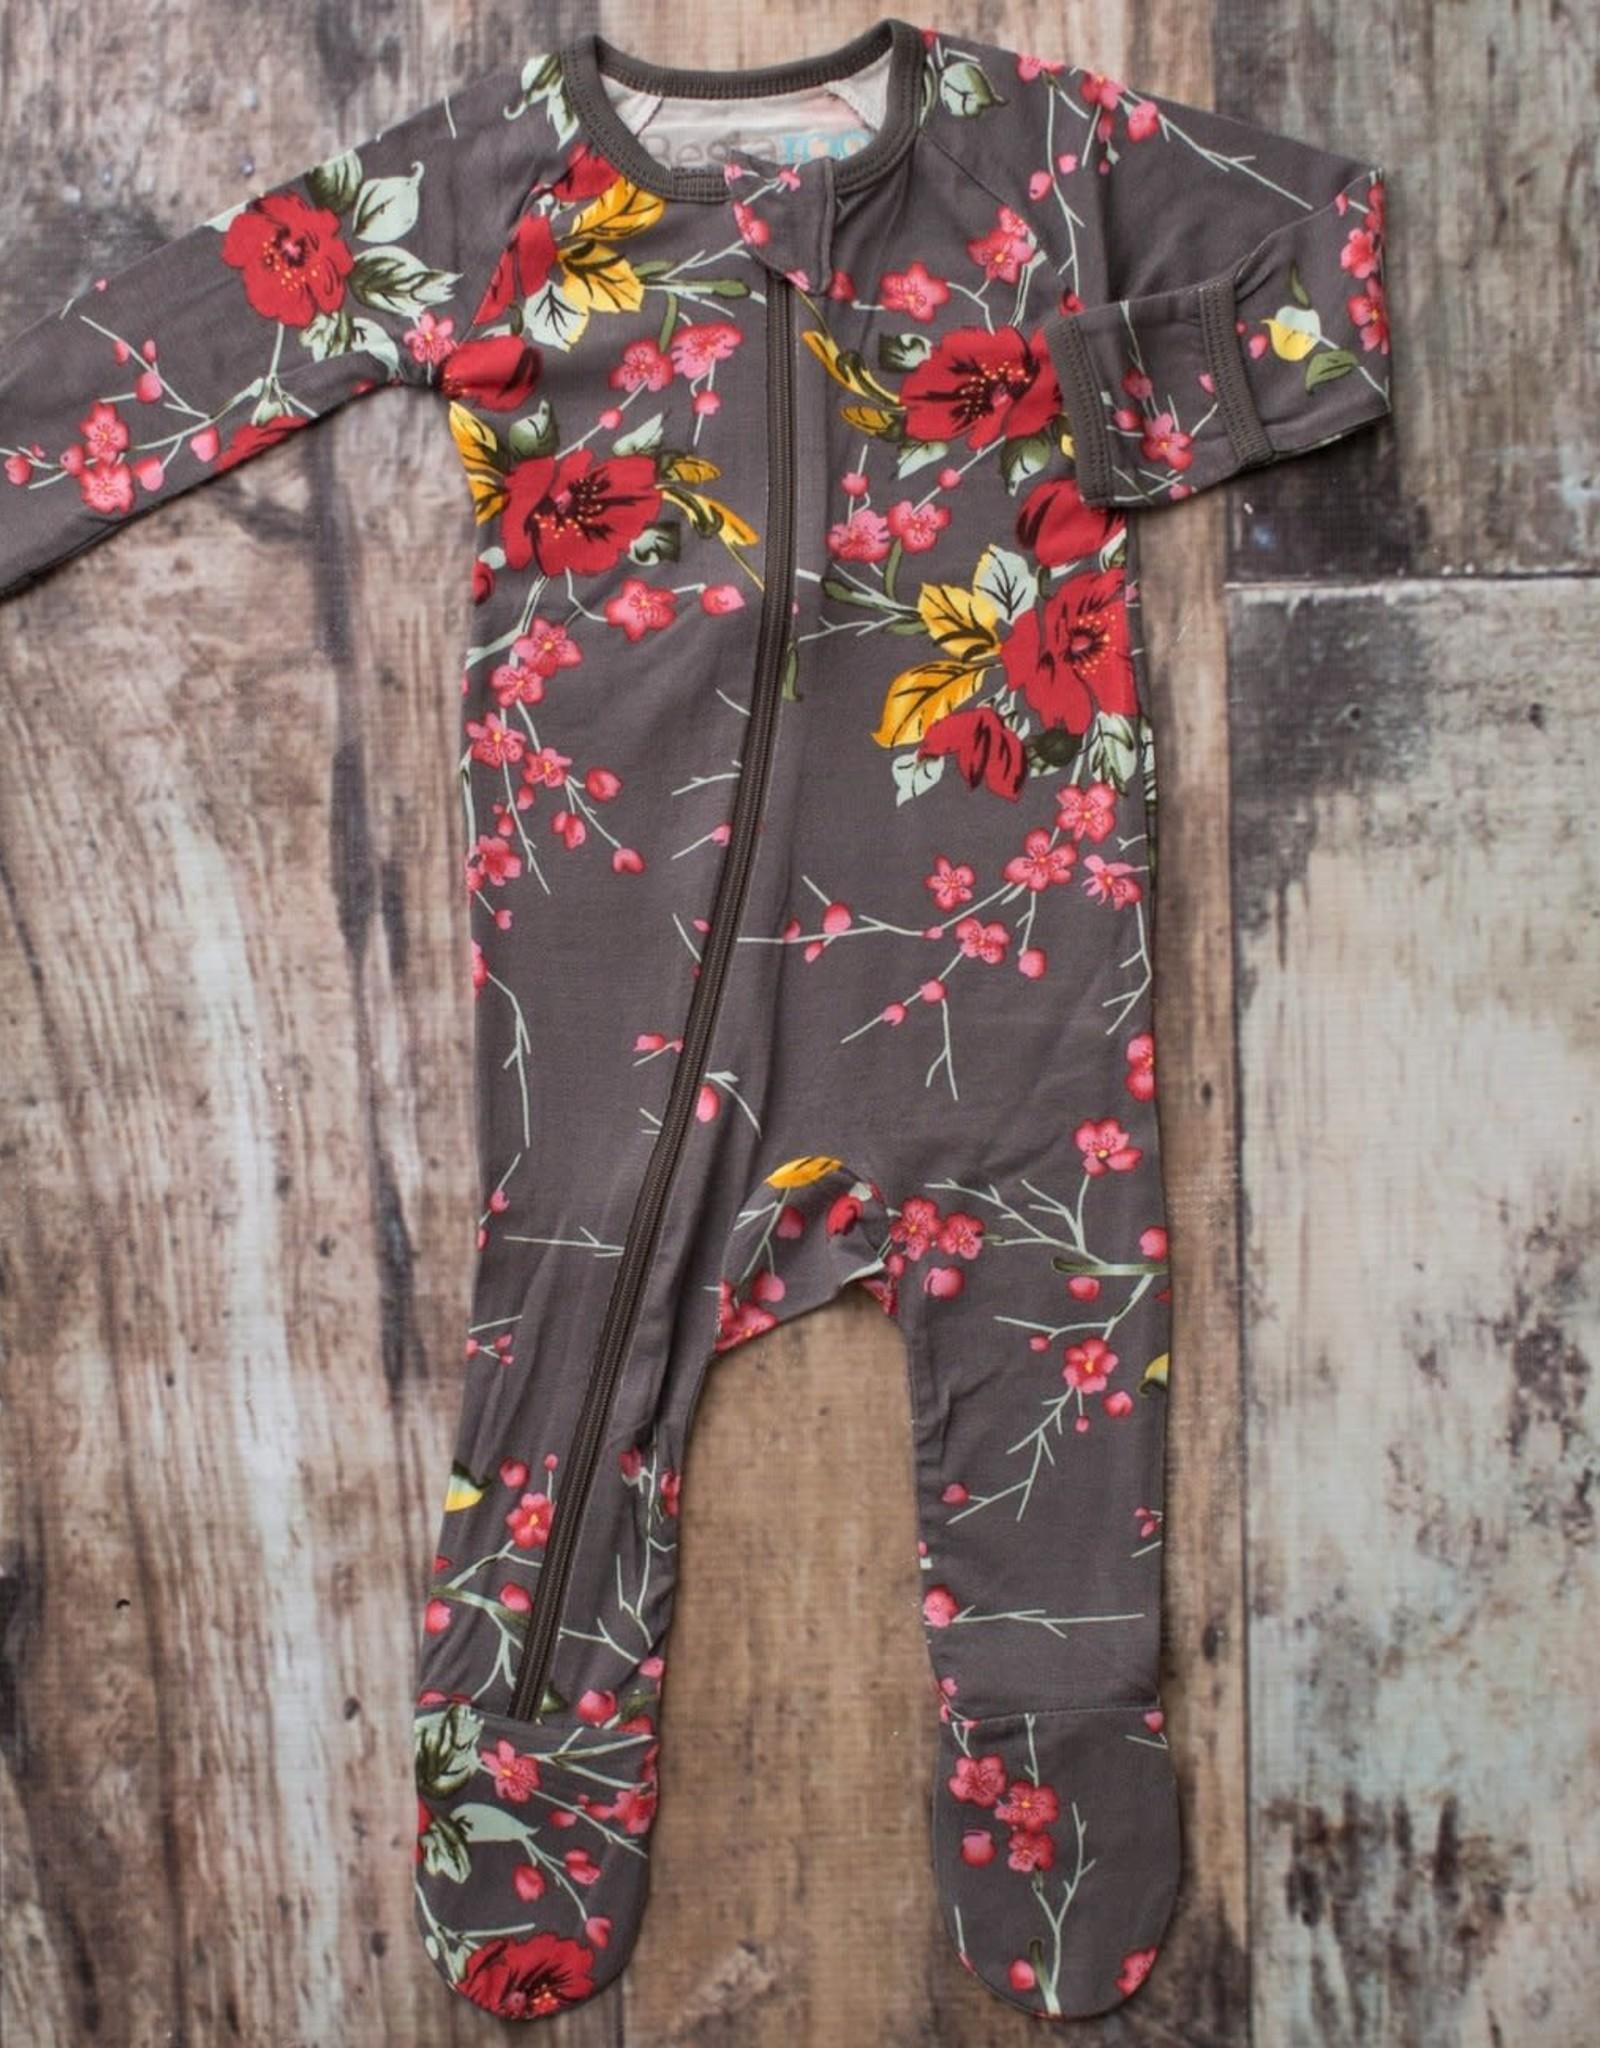 Bestaroo Footie - Cherry Blossoms - Charcoal